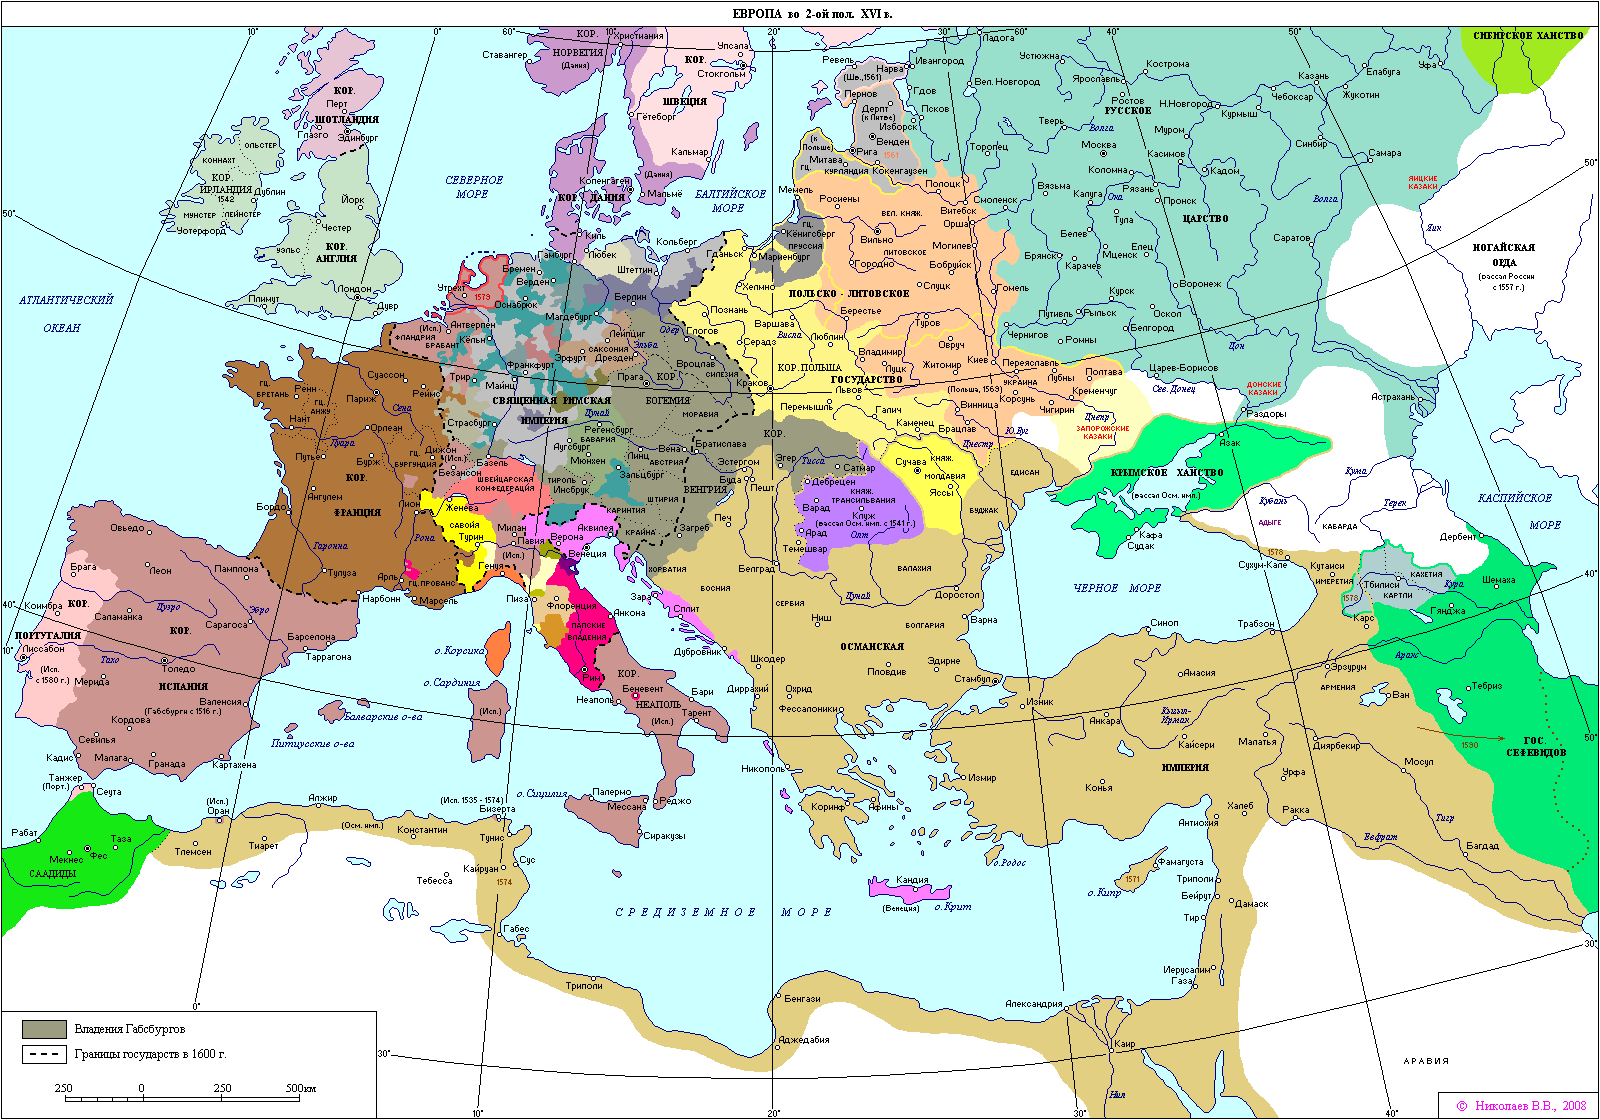 040-europe1550-1600